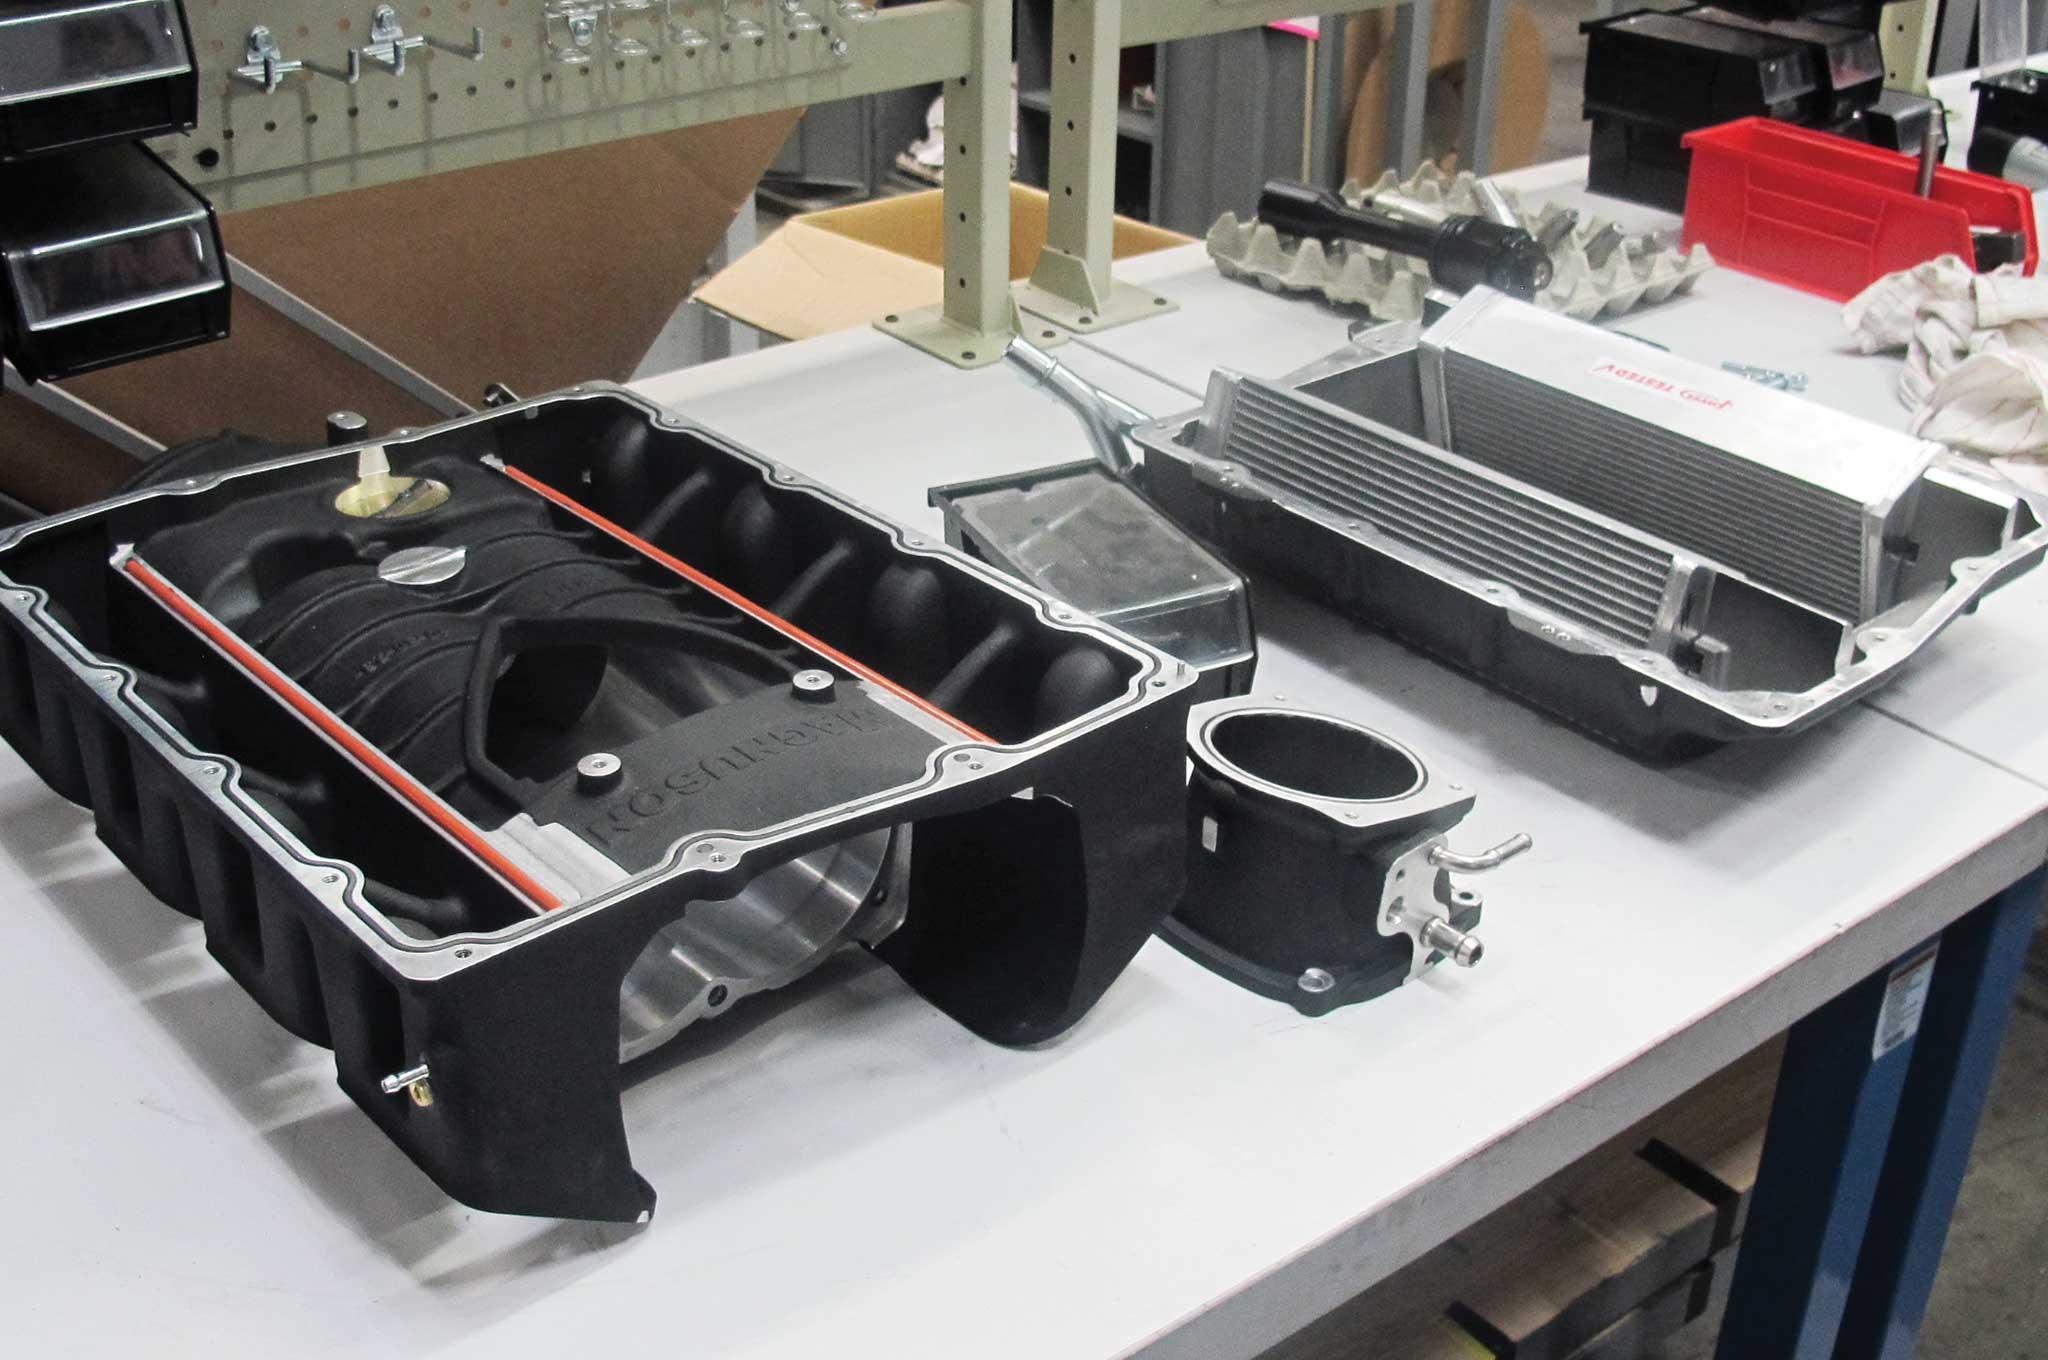 magnuson-supercharger-systems-intake-manifold-intercooler